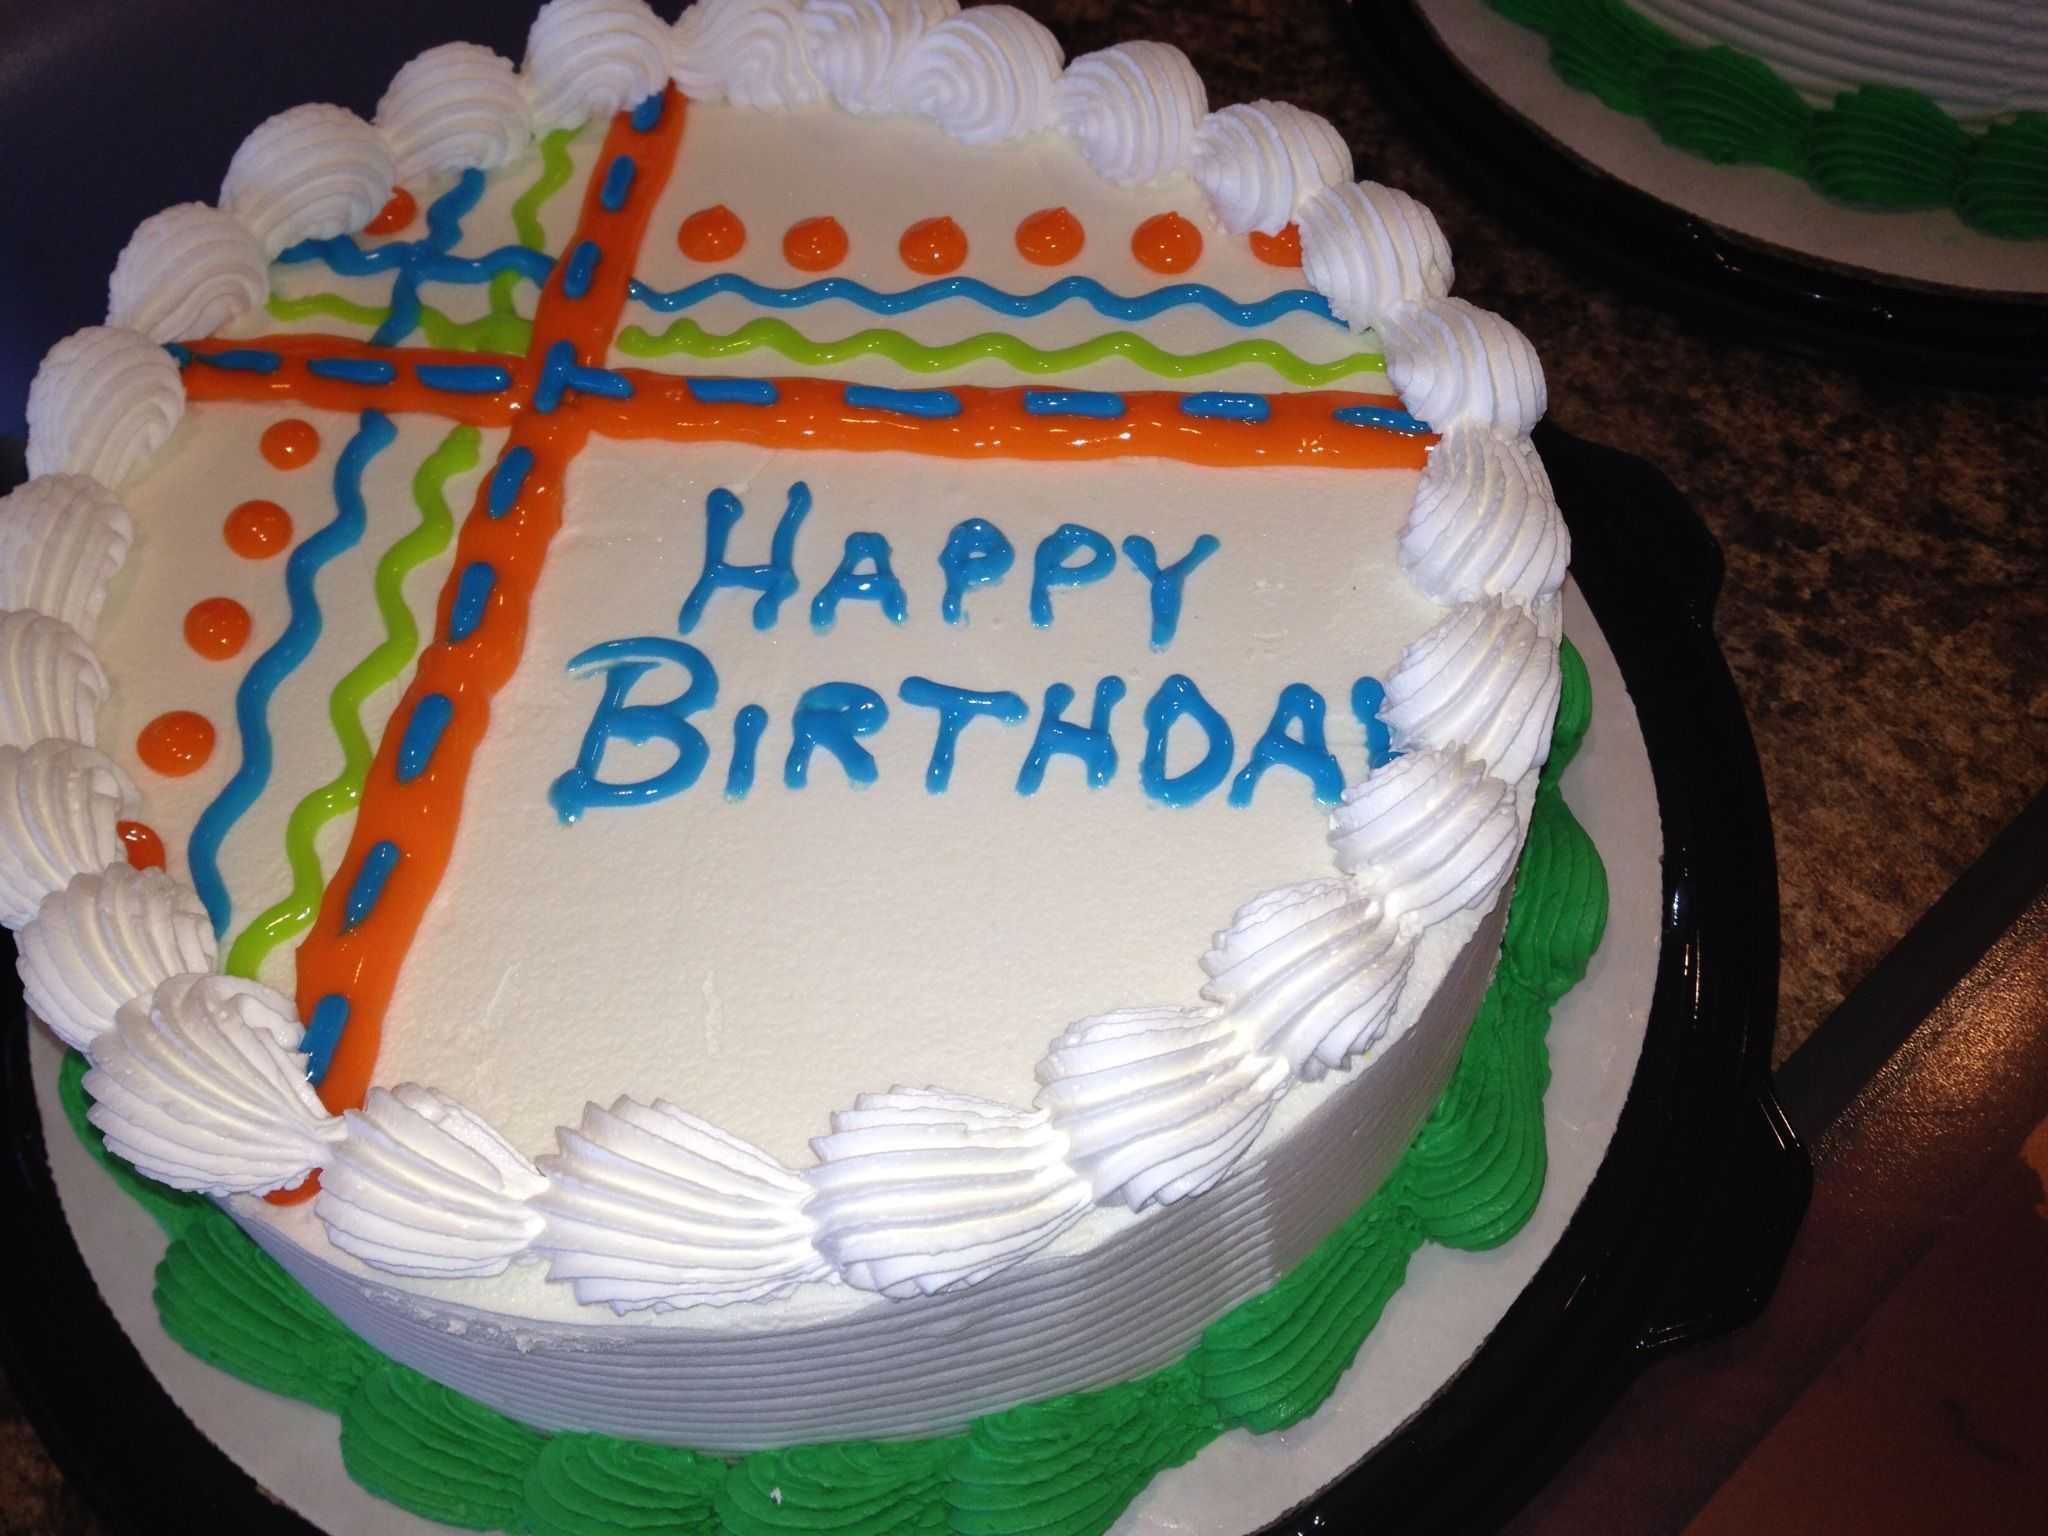 Simple Gel Design Dq Cakes Dairy Queen Cakes Pinterest Cake